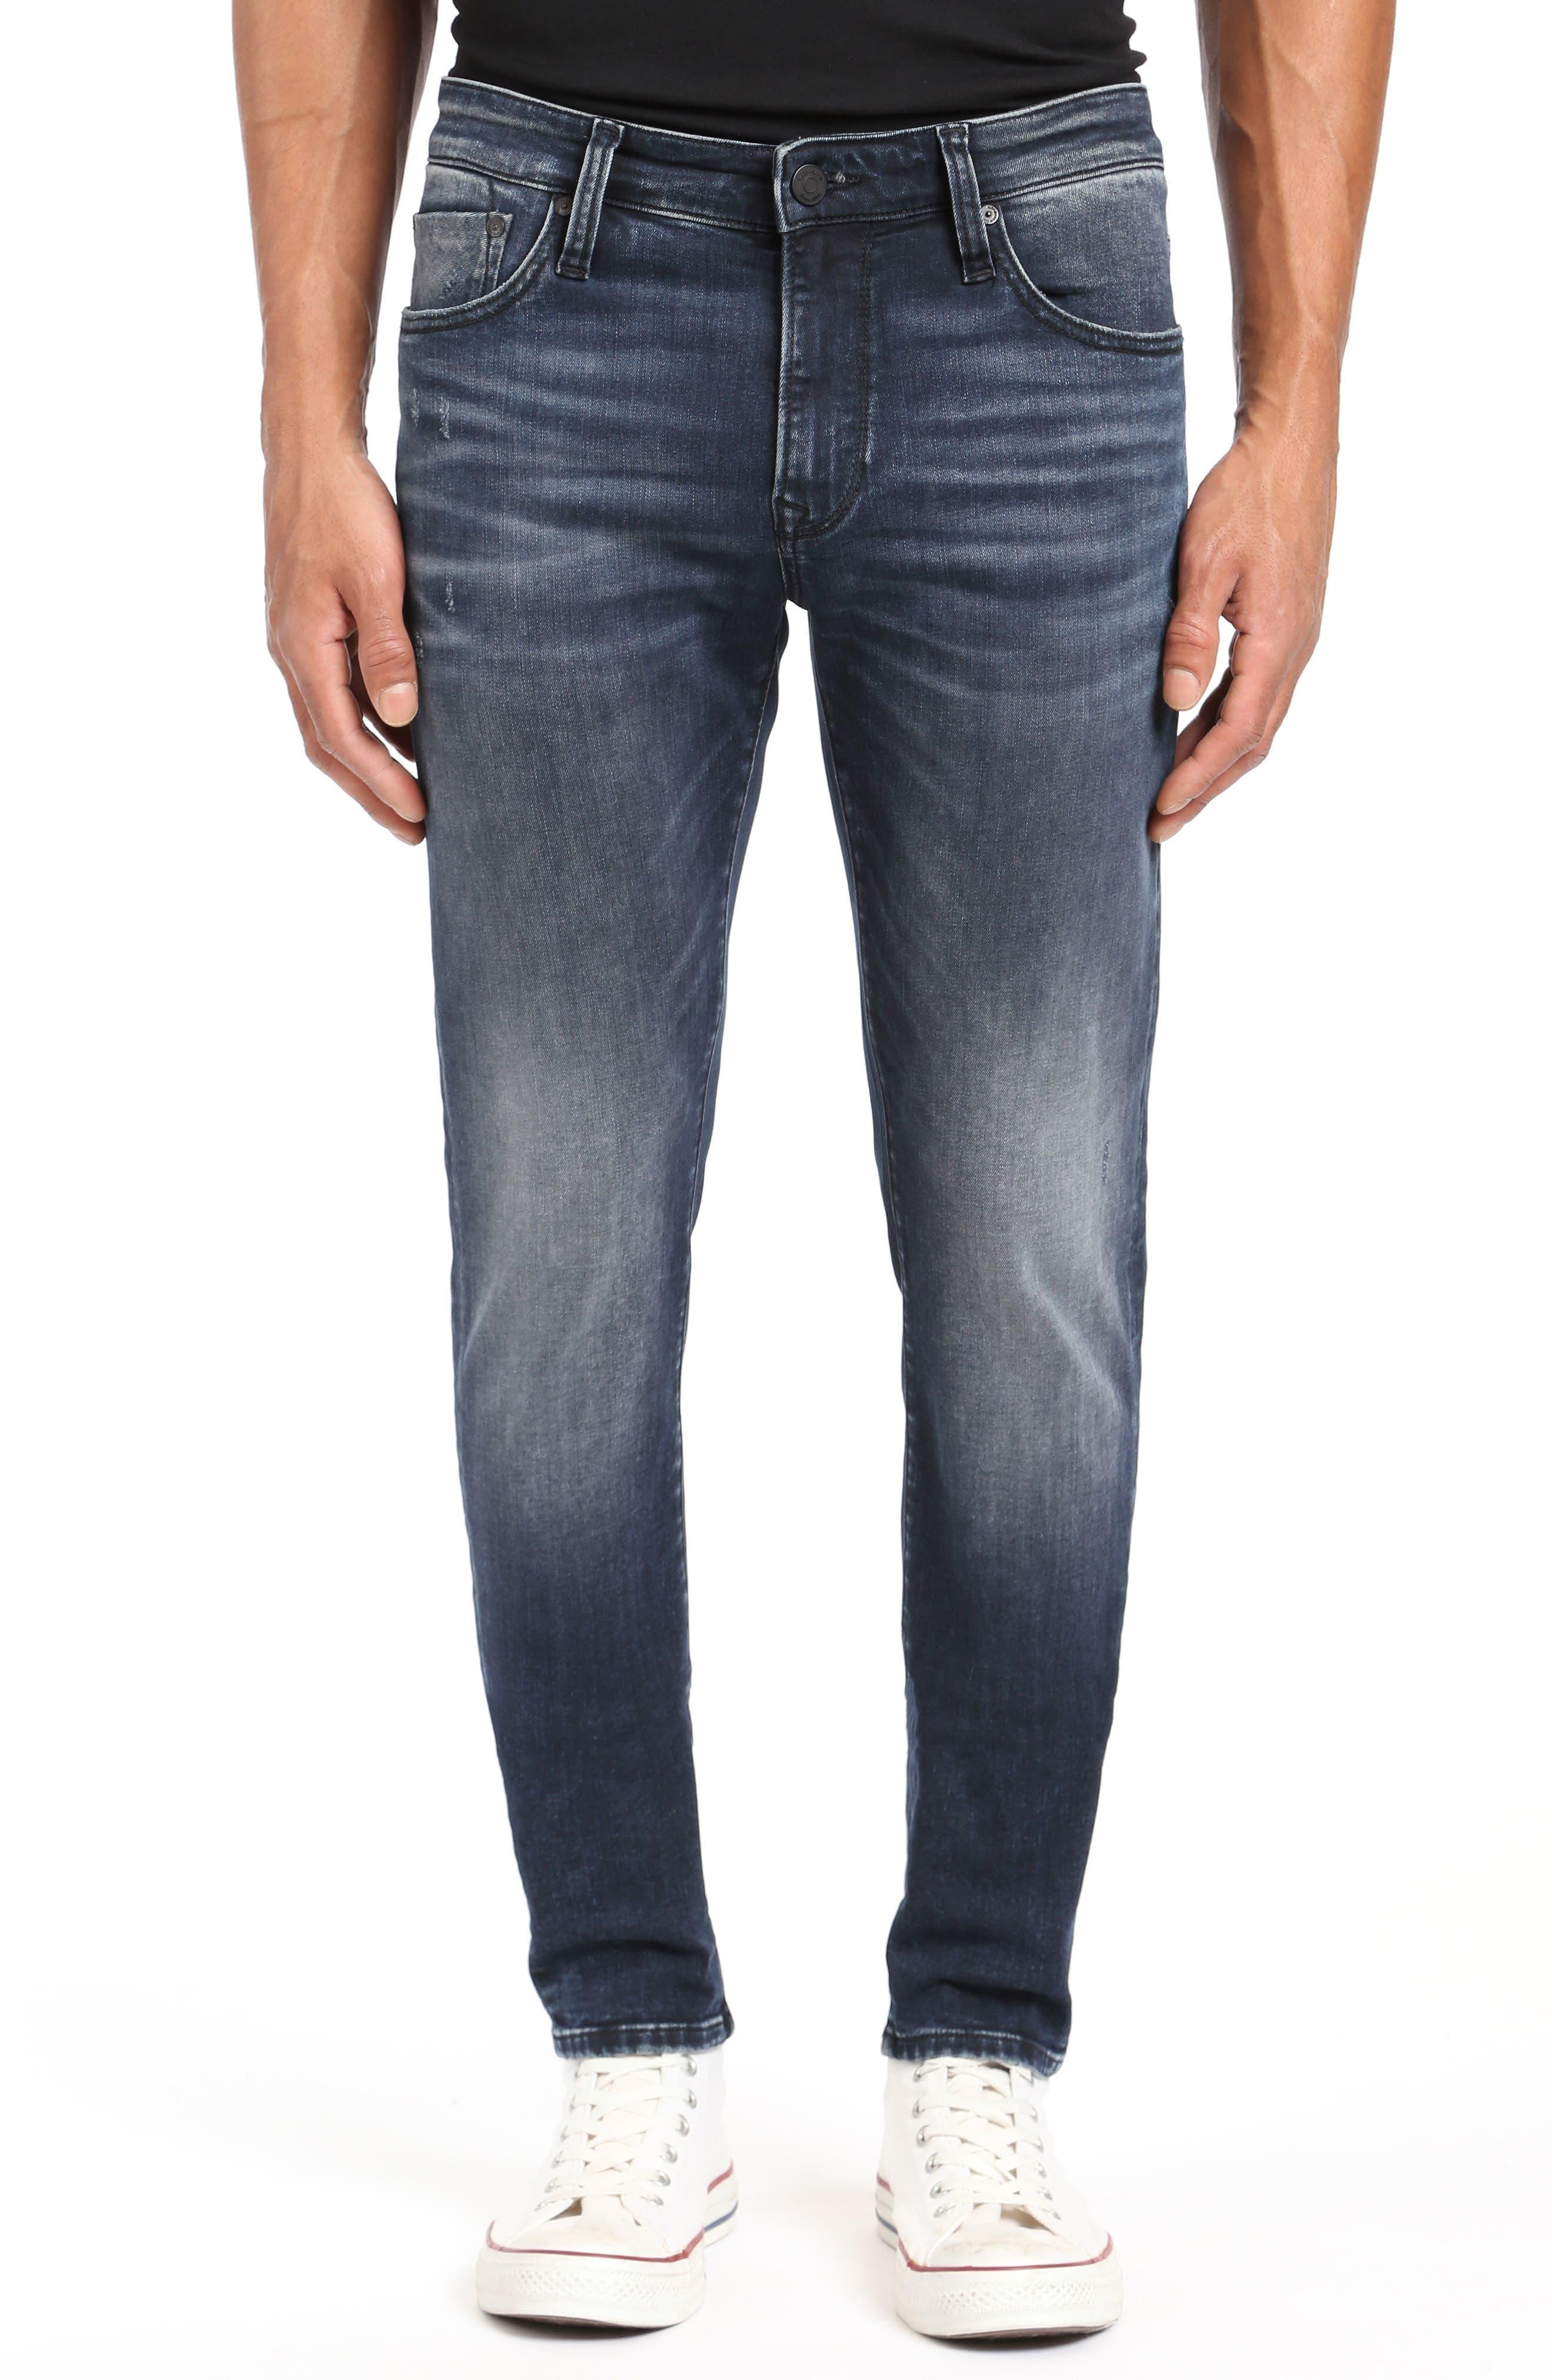 MAVI James Skinny Fit Jeans In Ink Brushed Authentic Vintage